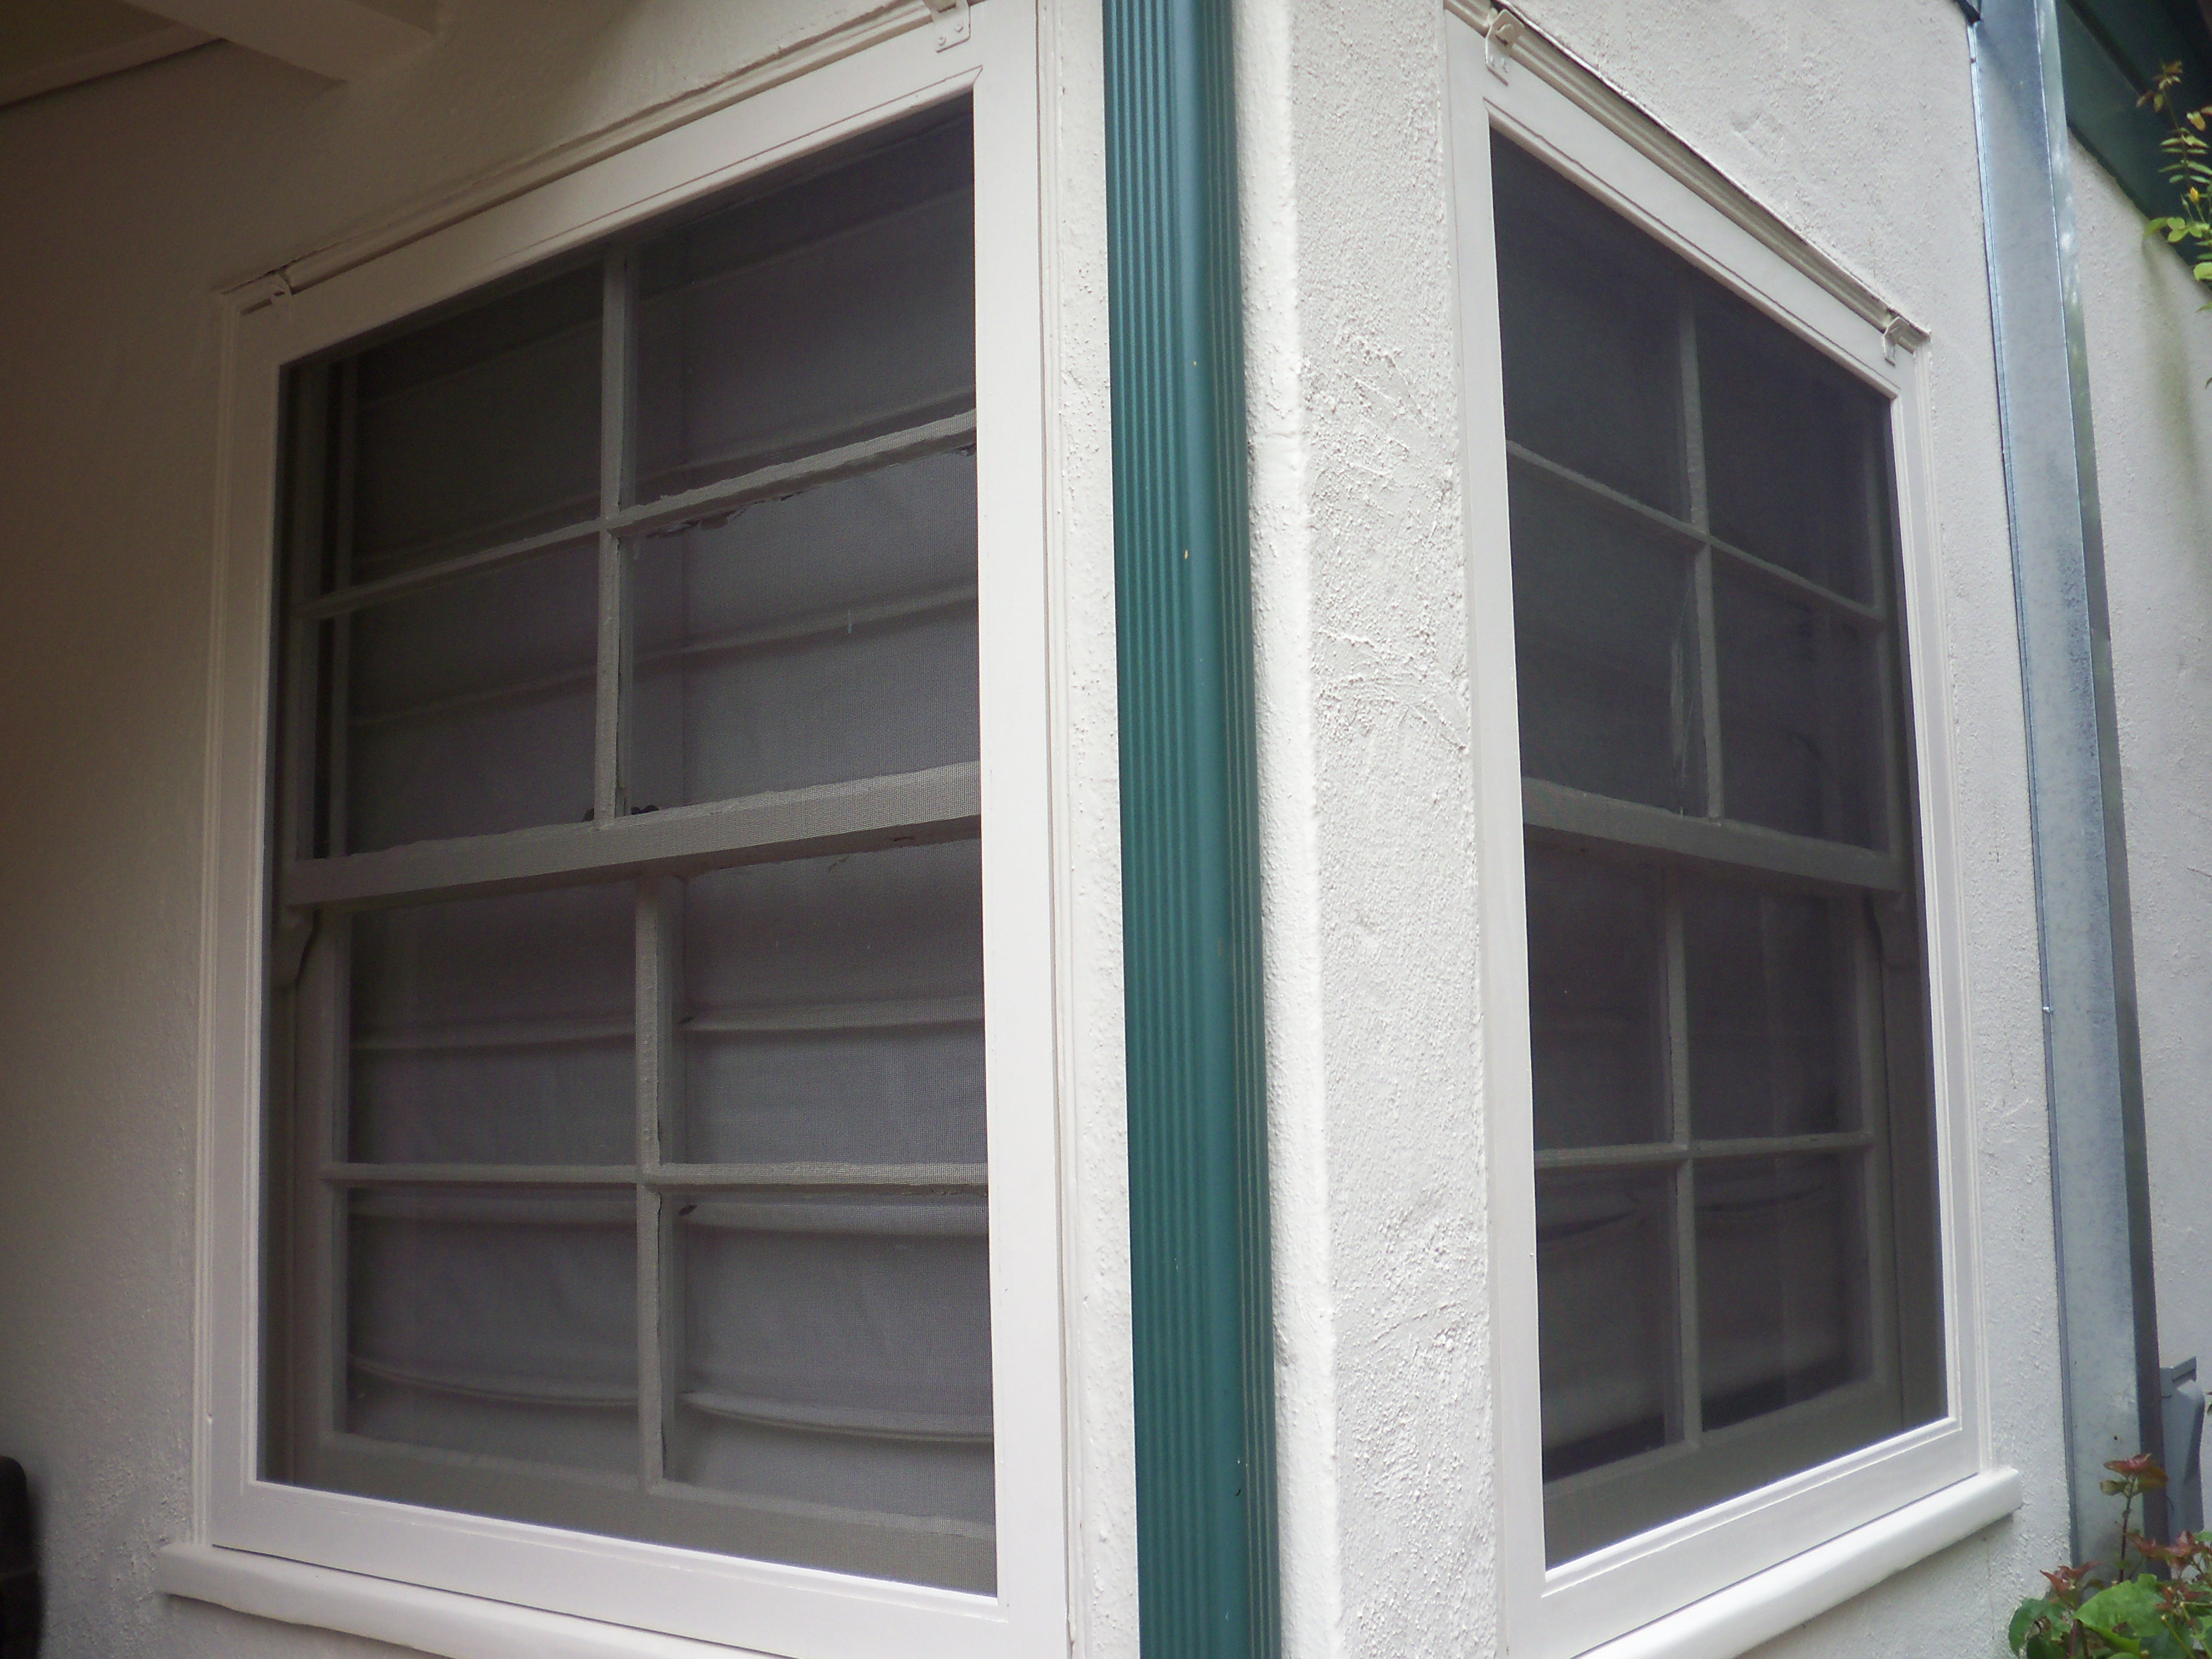 Window Screens on Double Hung Windows |